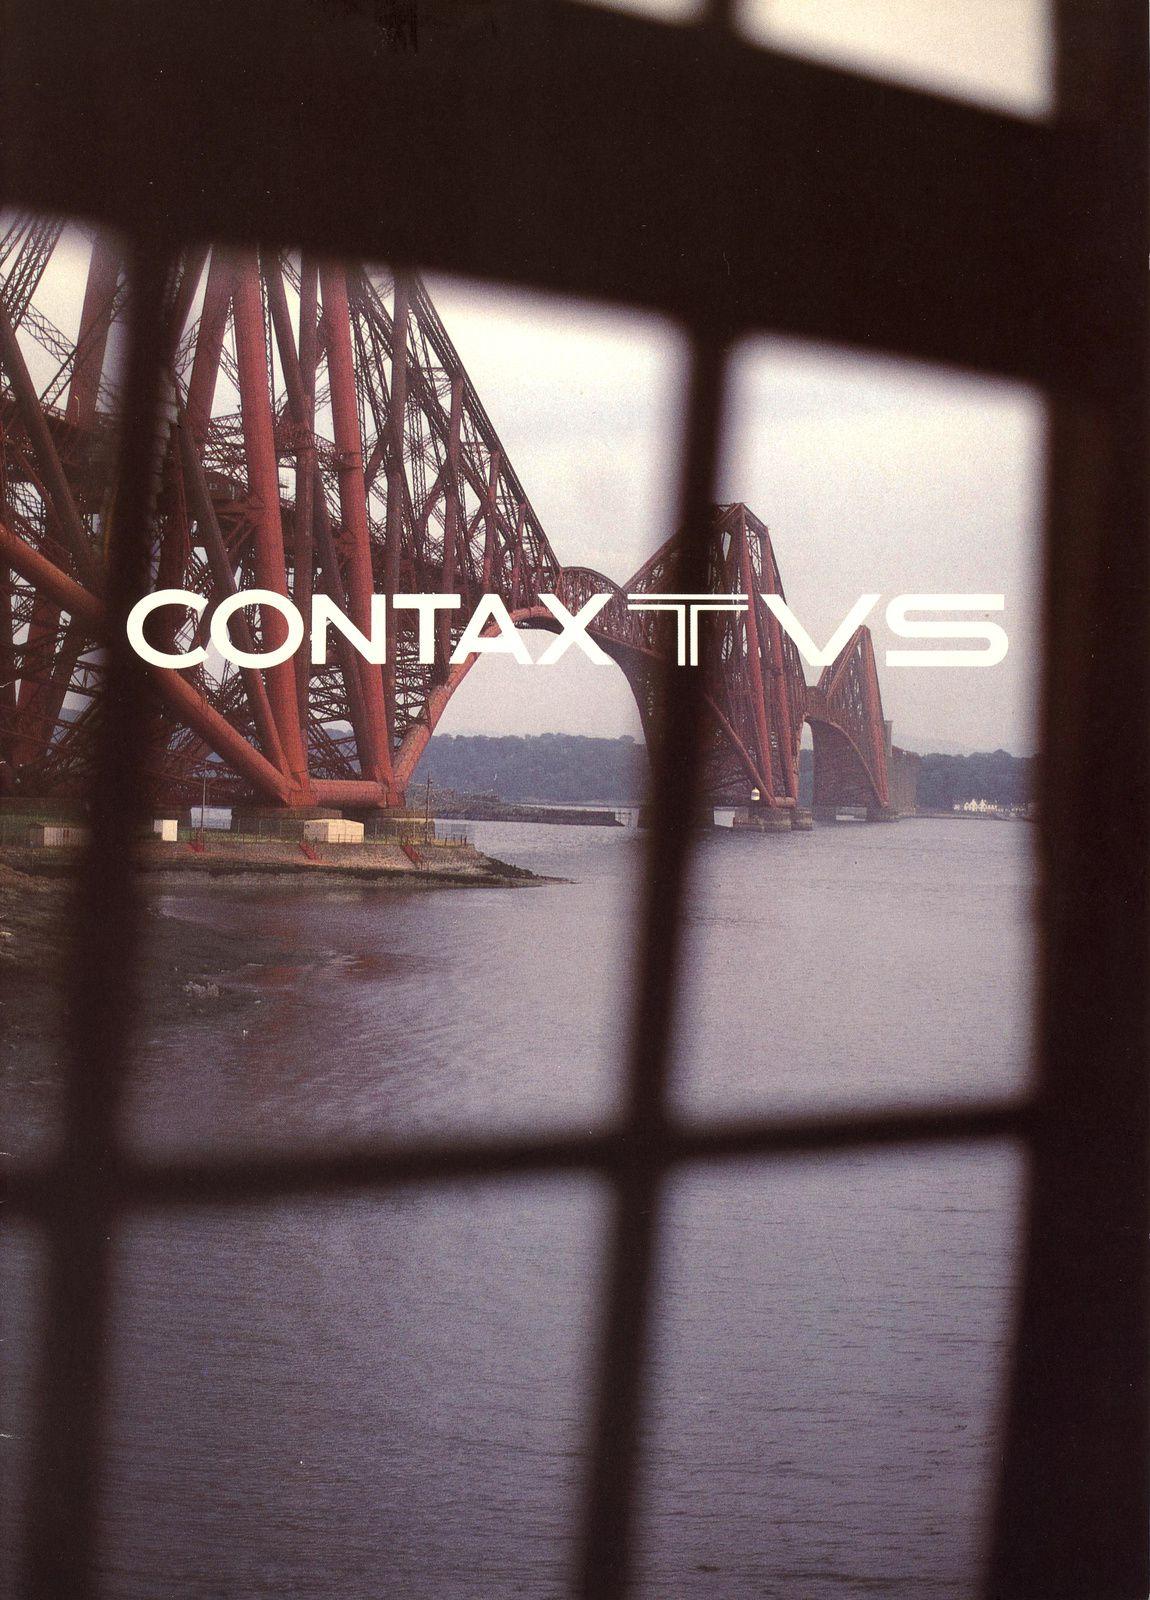 Contax TVS